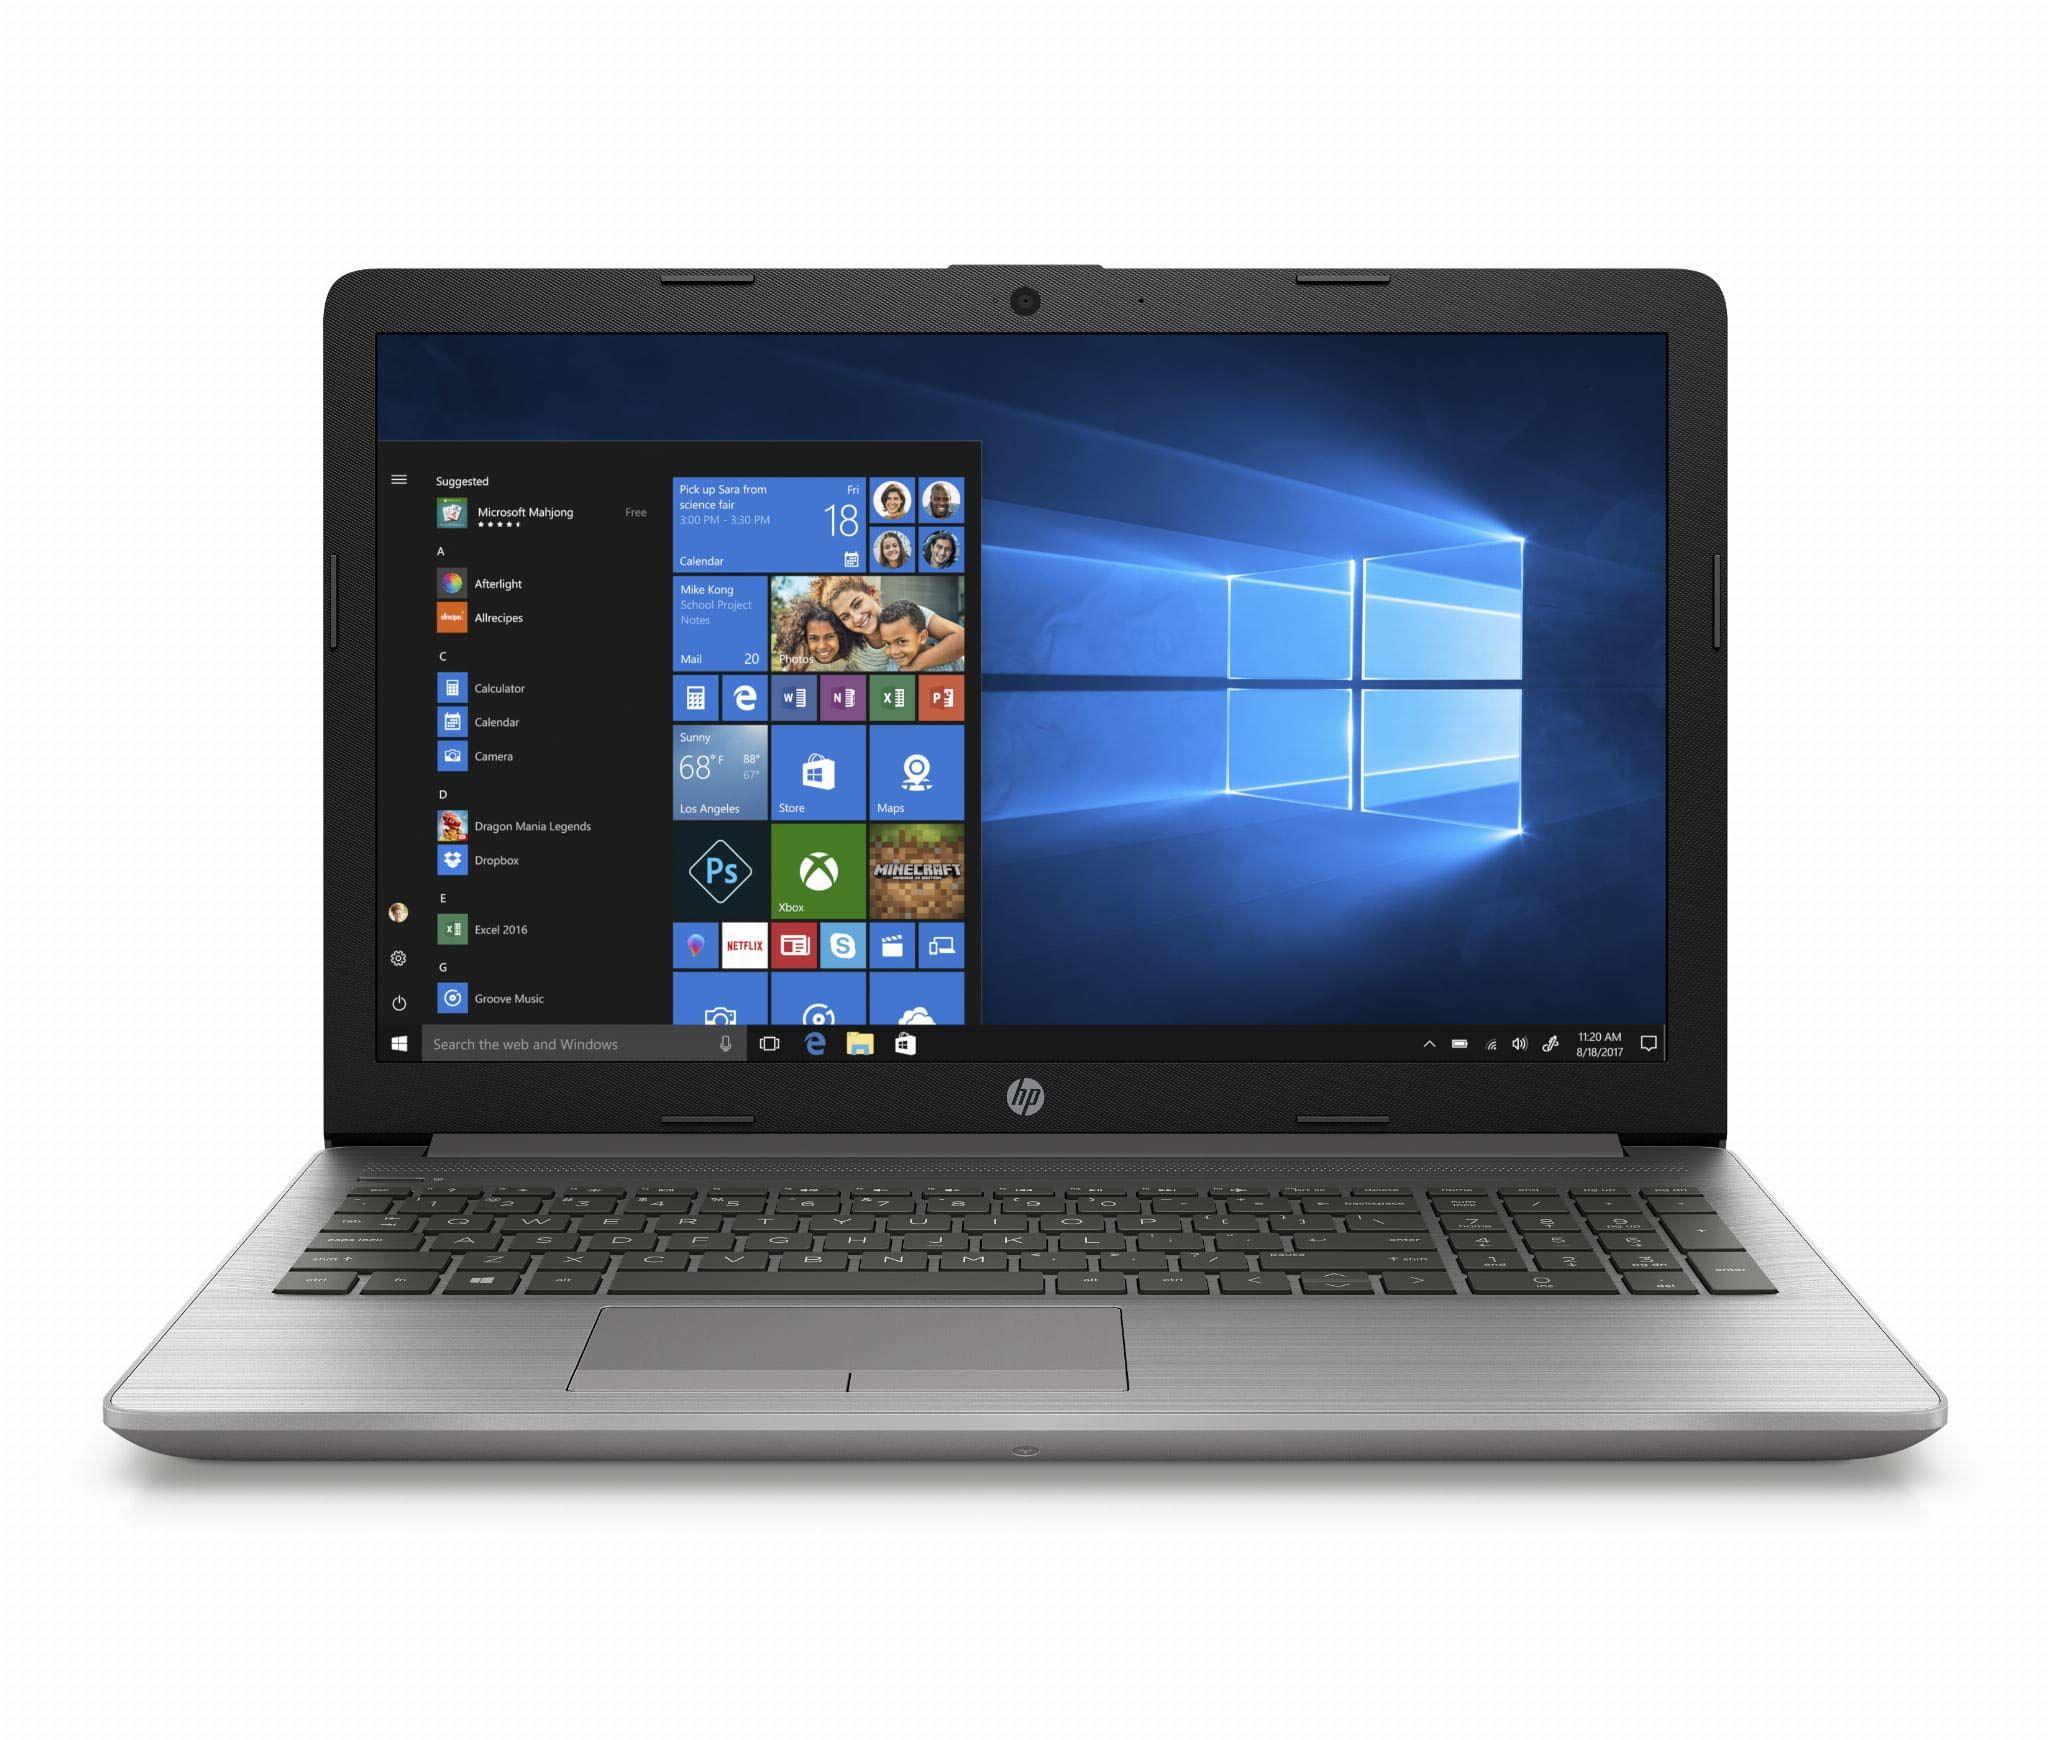 "HP 255 G7 15.6"" FHD Laptop (AMD Ryzen 5 3500U, 8GB RAM, 256GB SSD, DVD-RW, Windows 10 Pro) Srebrny QWERTY"